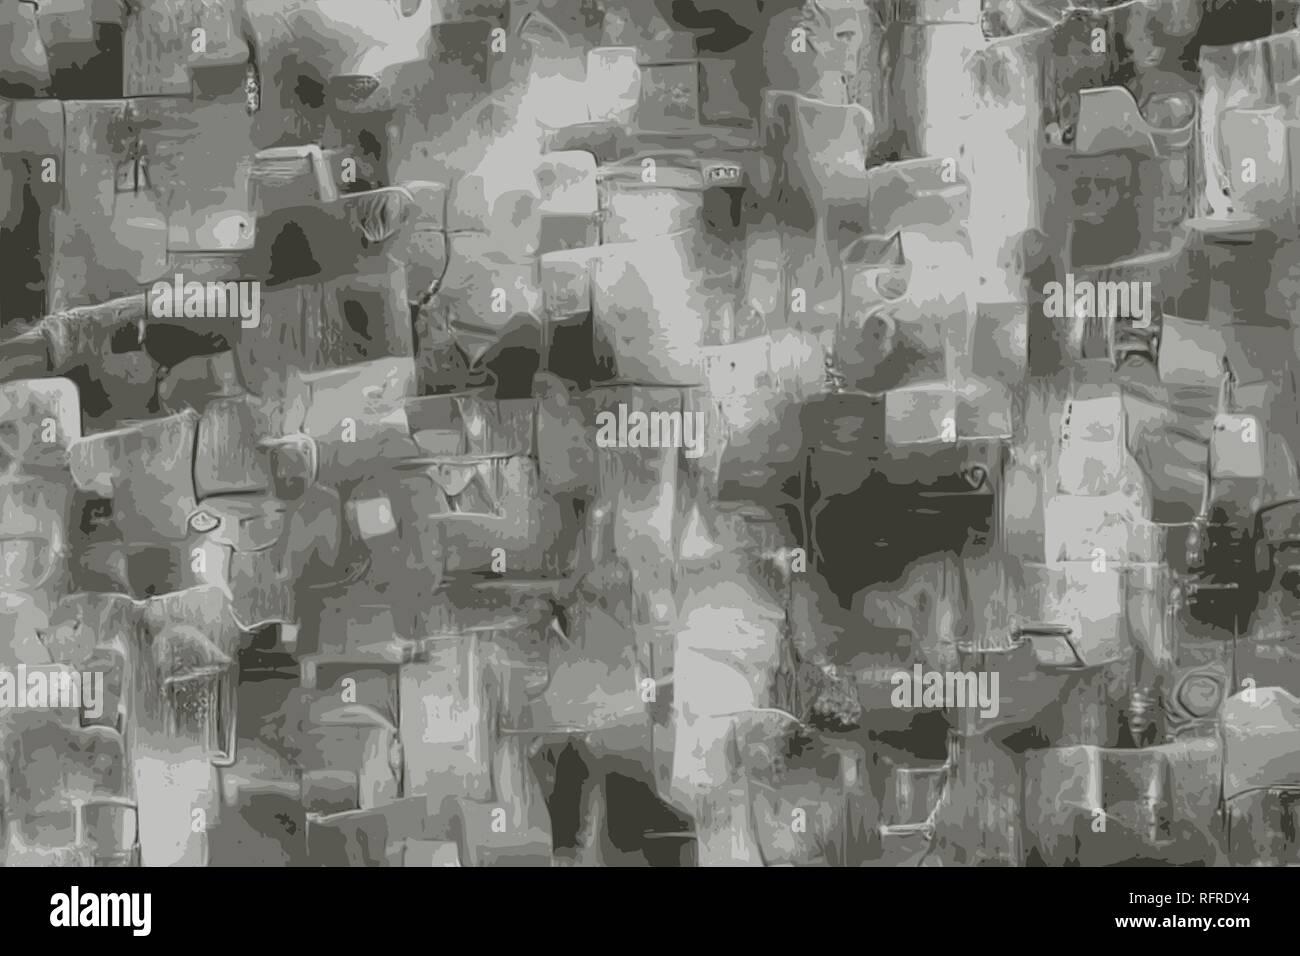 Limestone grunge texture, imitation of carbonate minerals - Stock Image